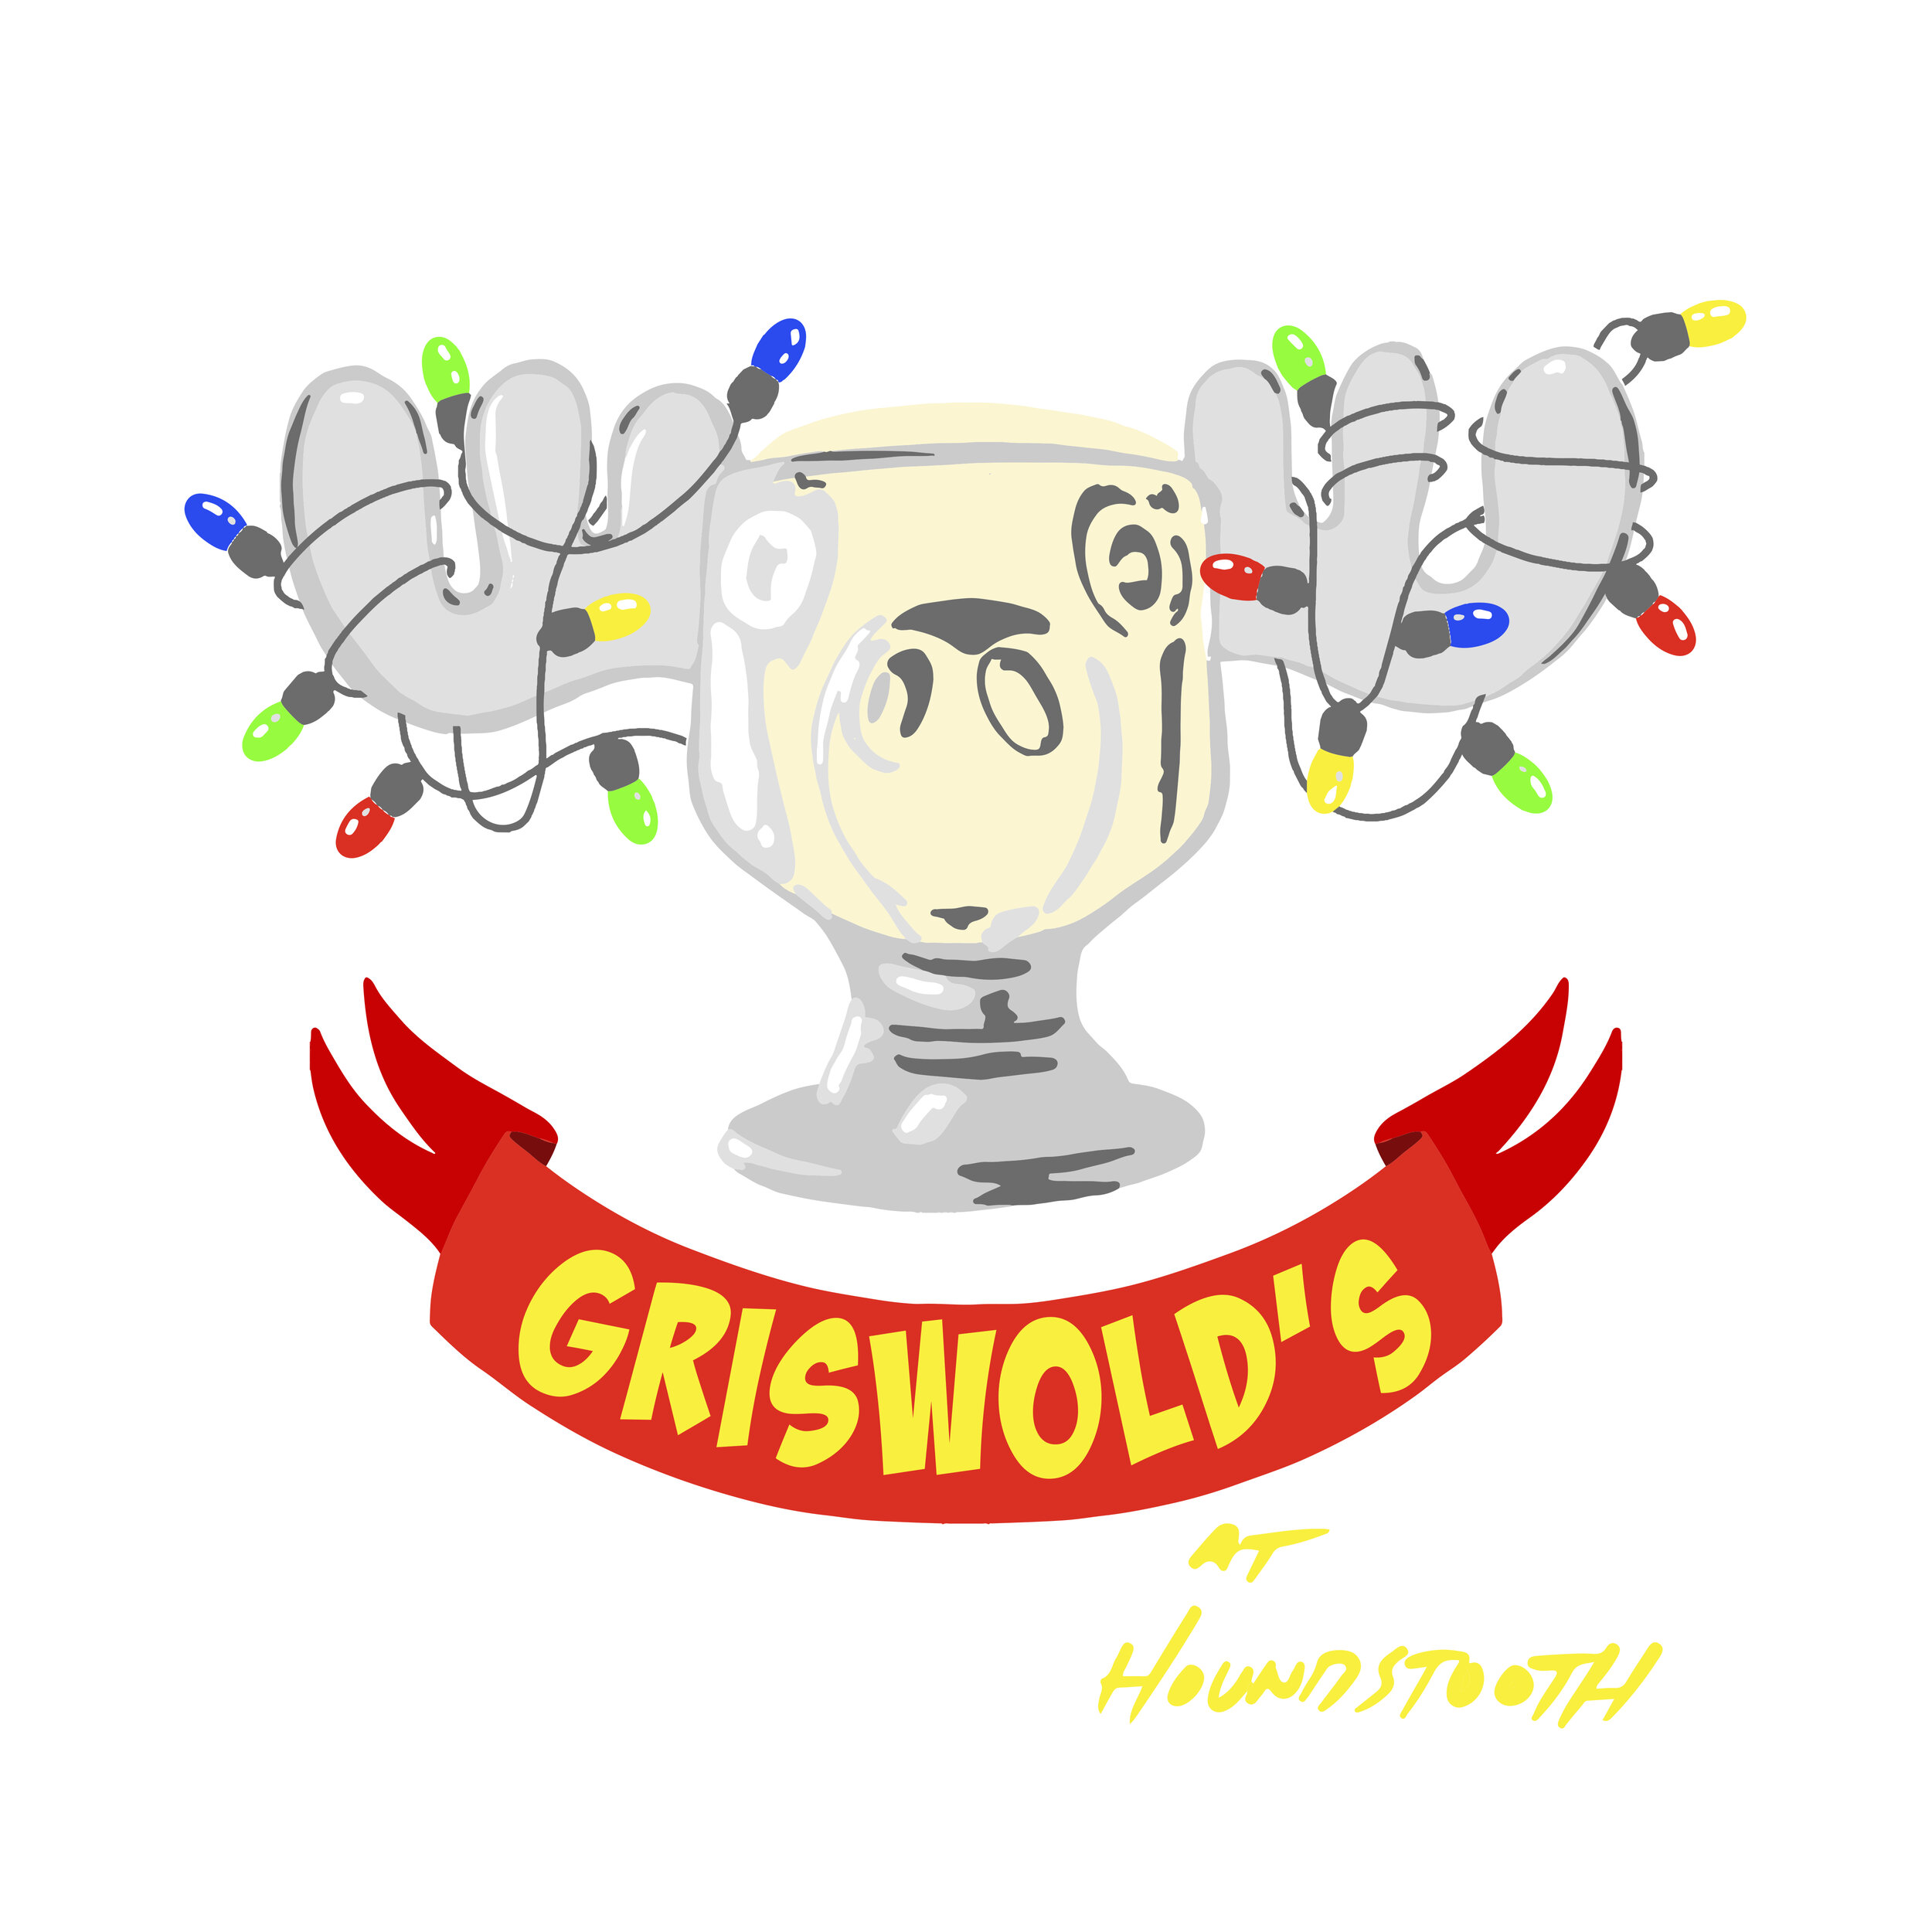 GriswaldsLogo_moose (1).jpg